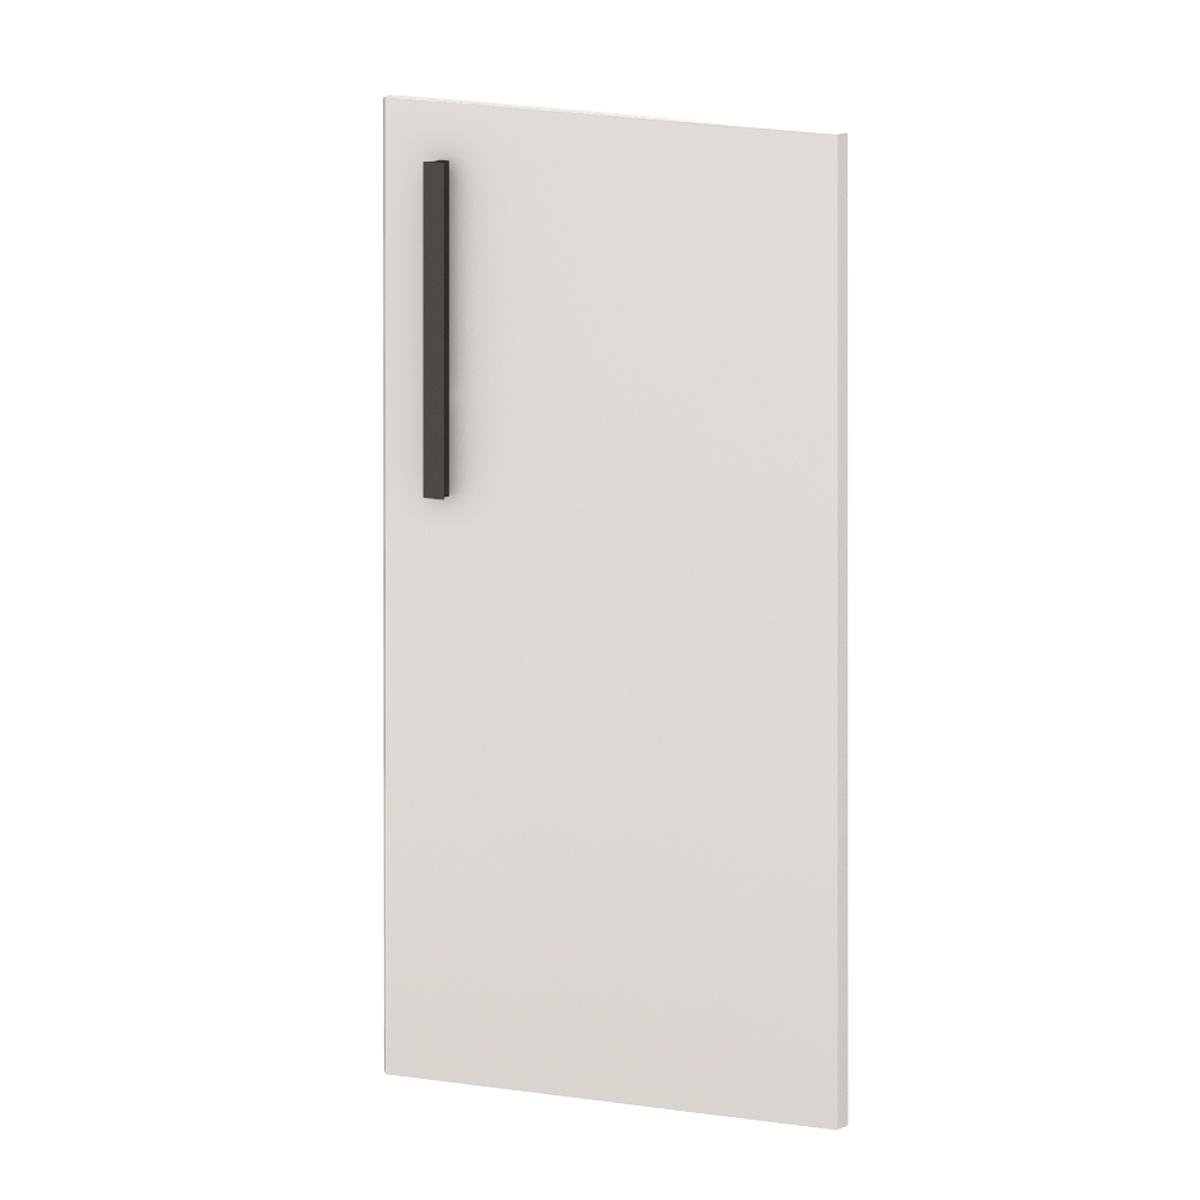 Дверь ЛДСП низкая T-011л/пр Lavana